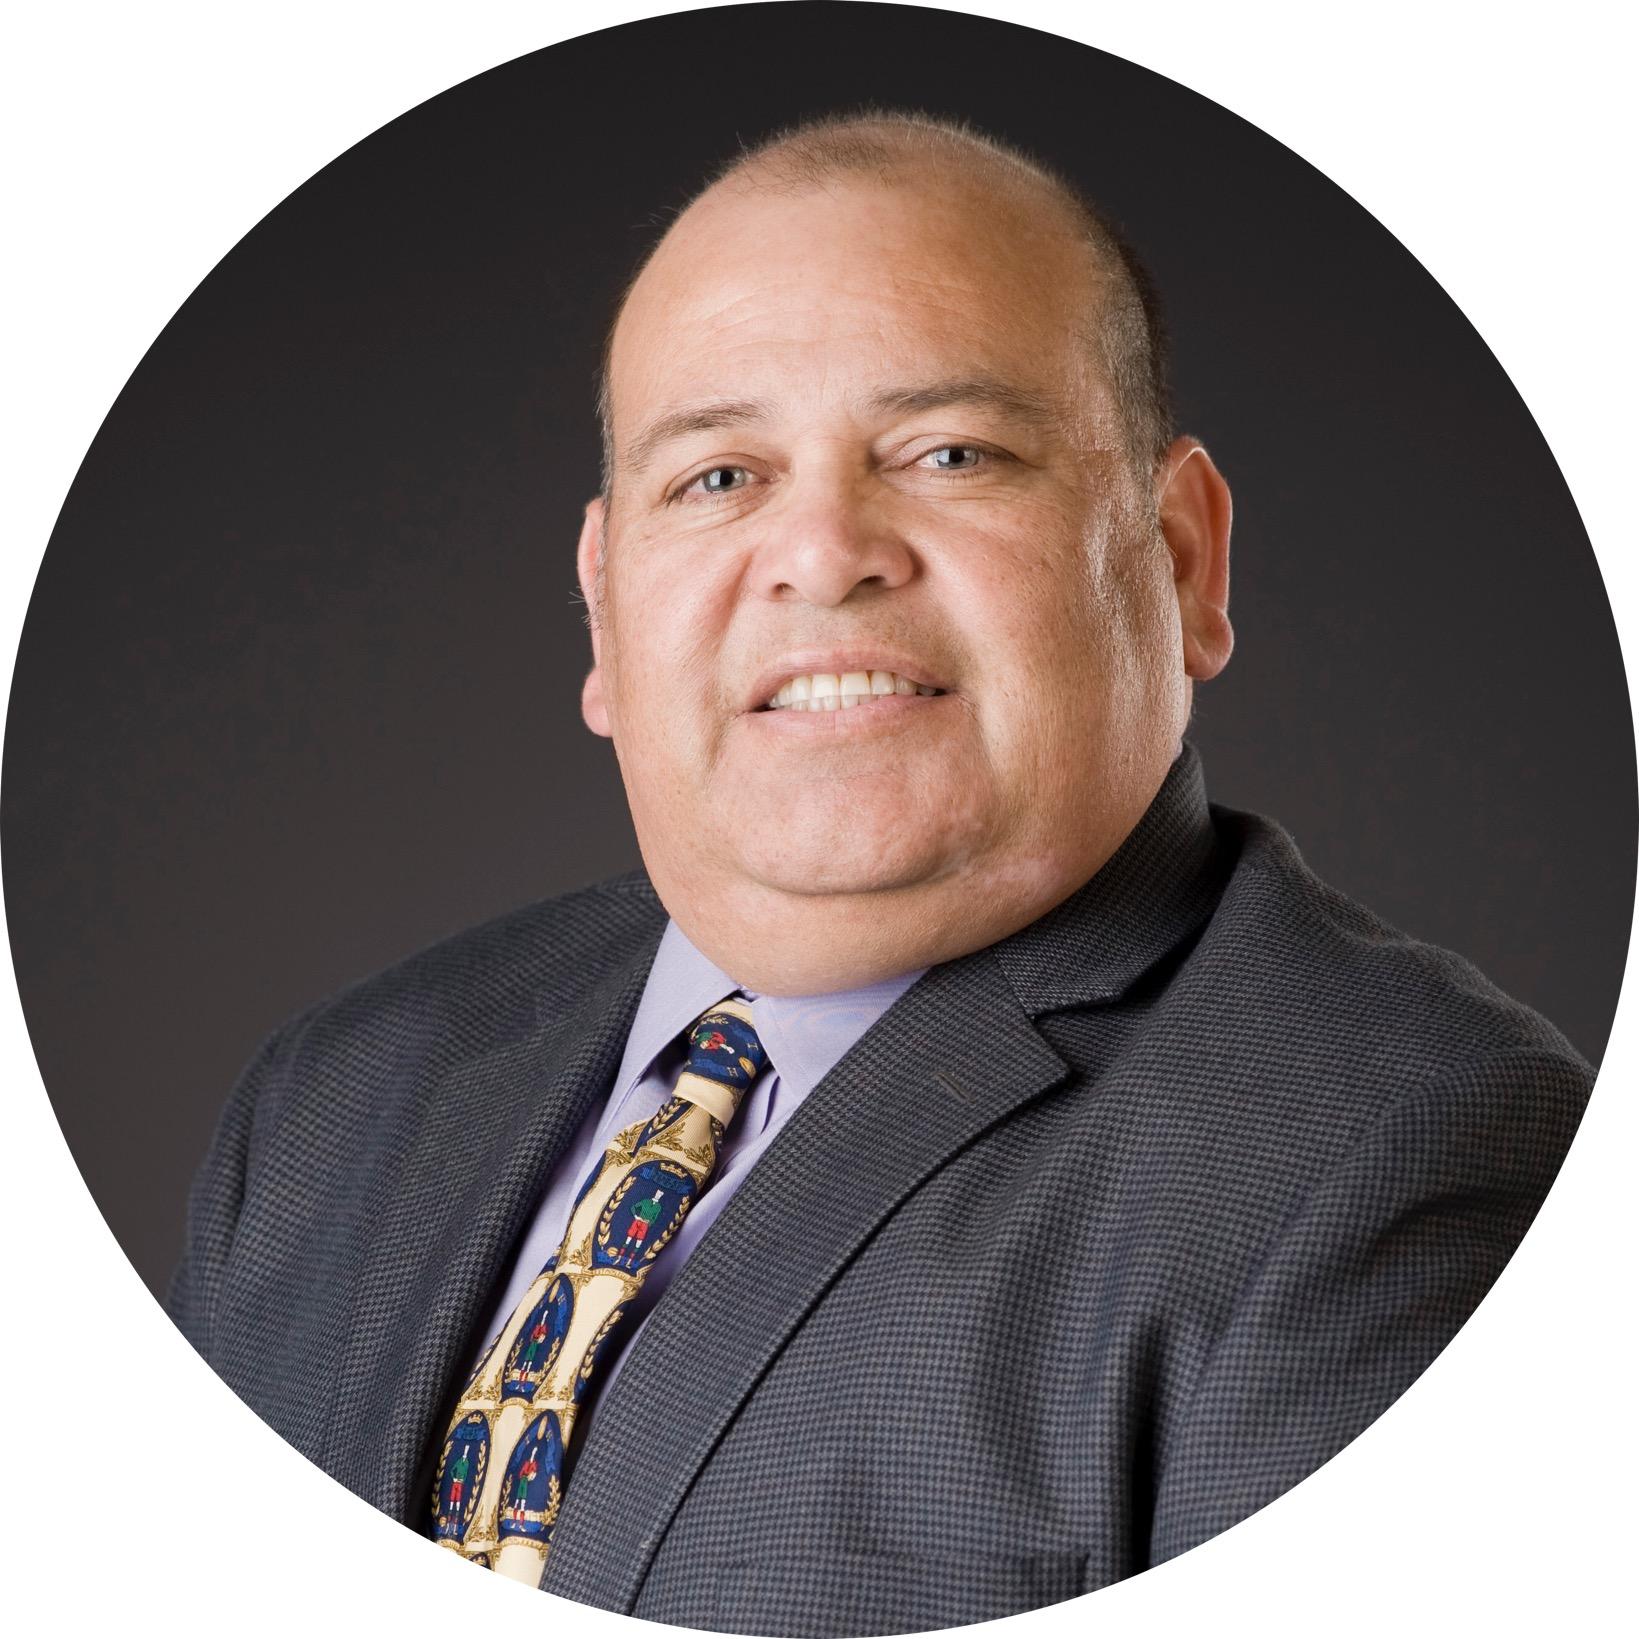 Lazaro Vasquez - MemberManager, McDonalds